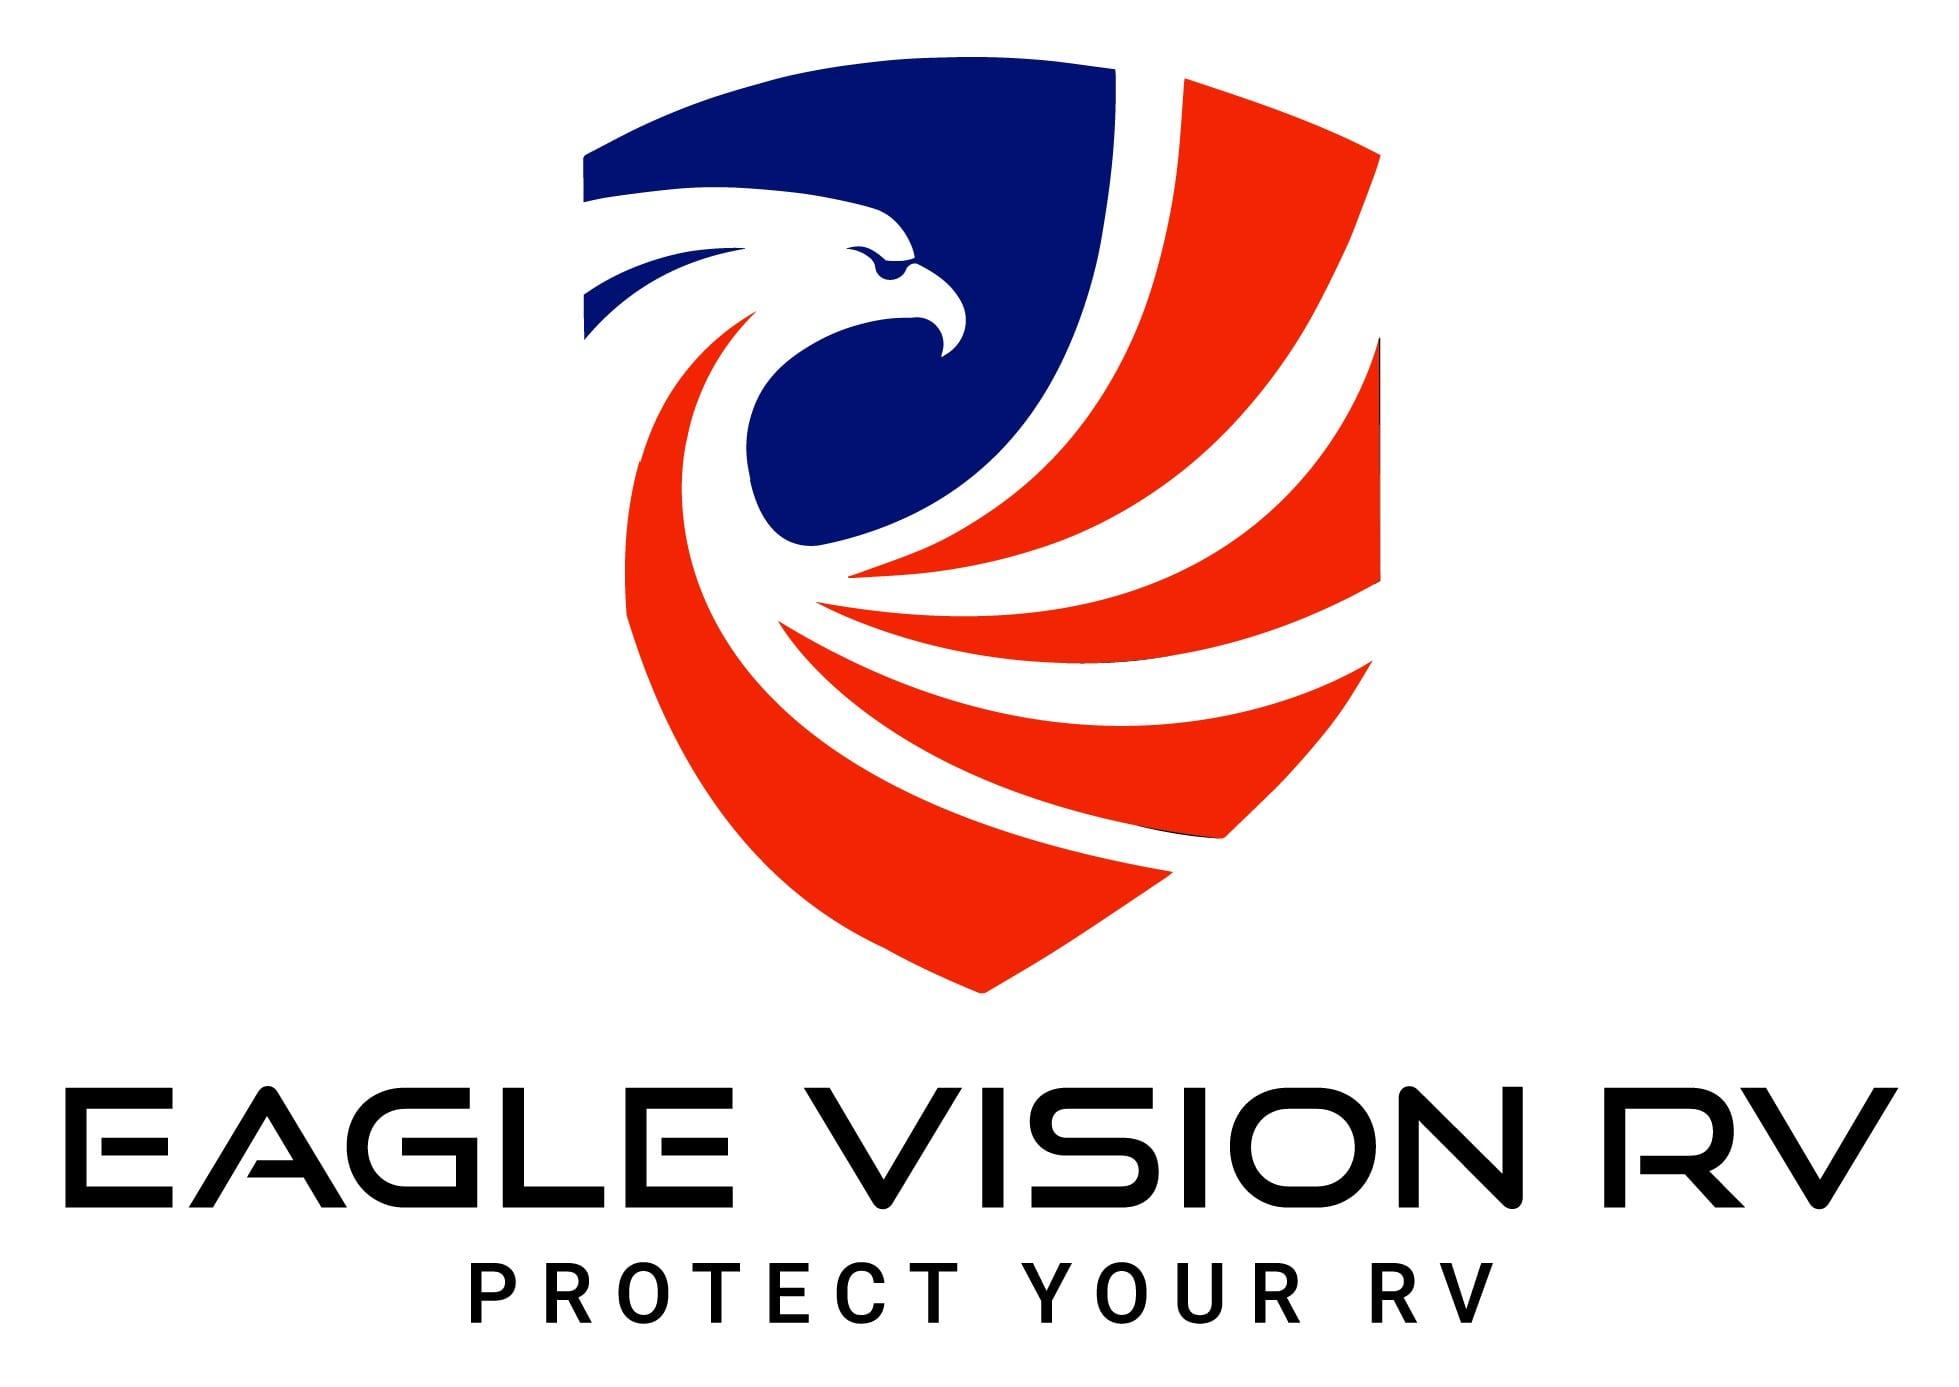 https://www.eaglevisionrv.com/